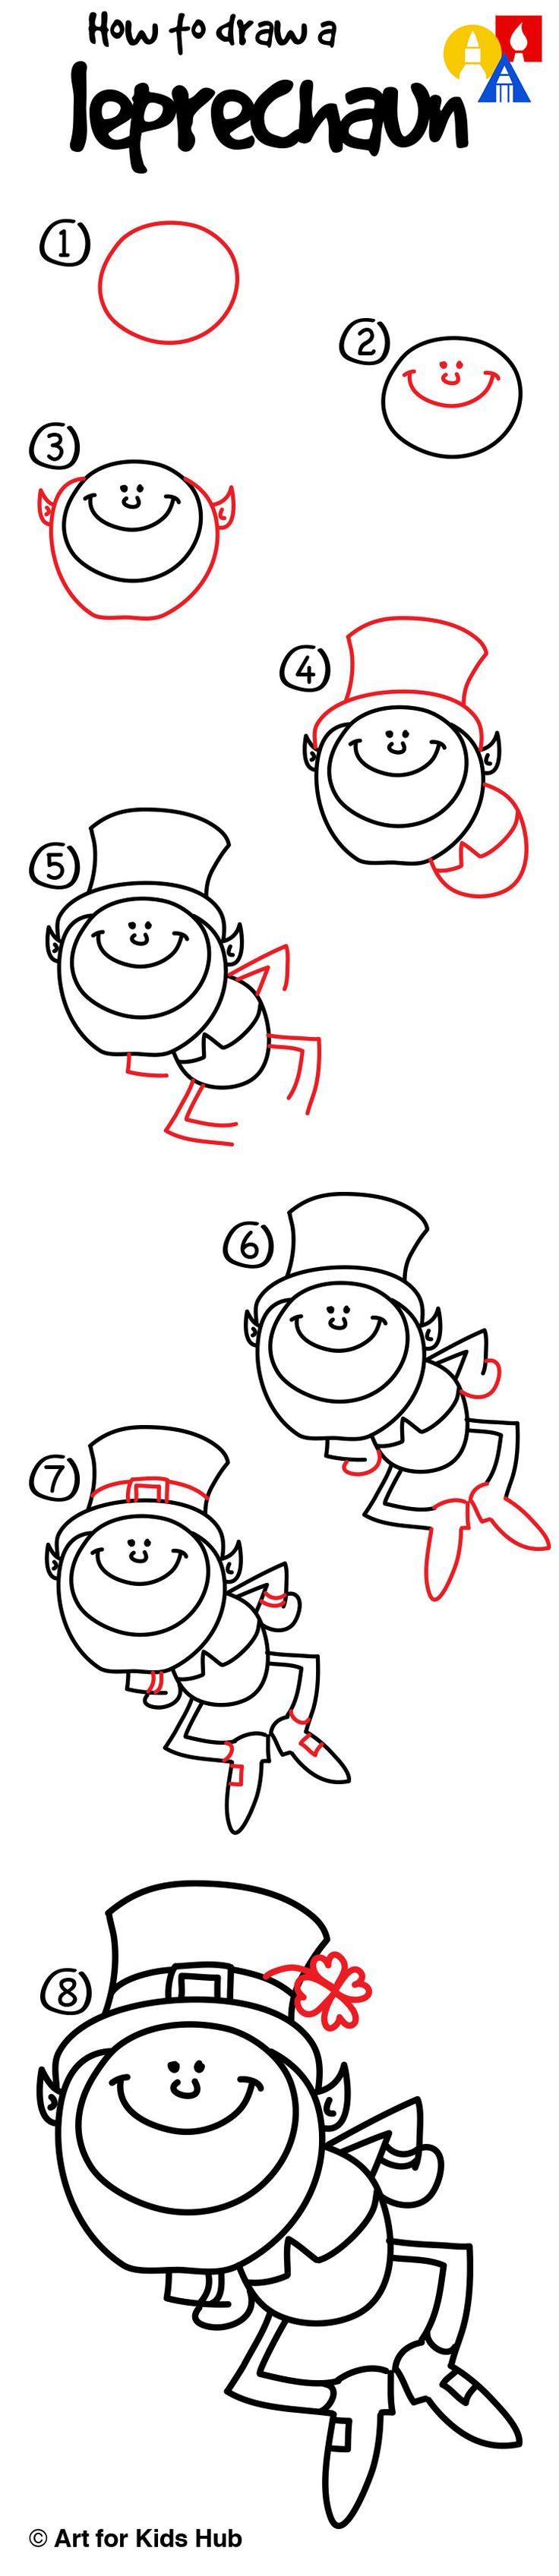 25 gorgeous leprechaun ideas on pinterest what is a gnome how to draw a leprechaun art for kids hub ccuart Choice Image